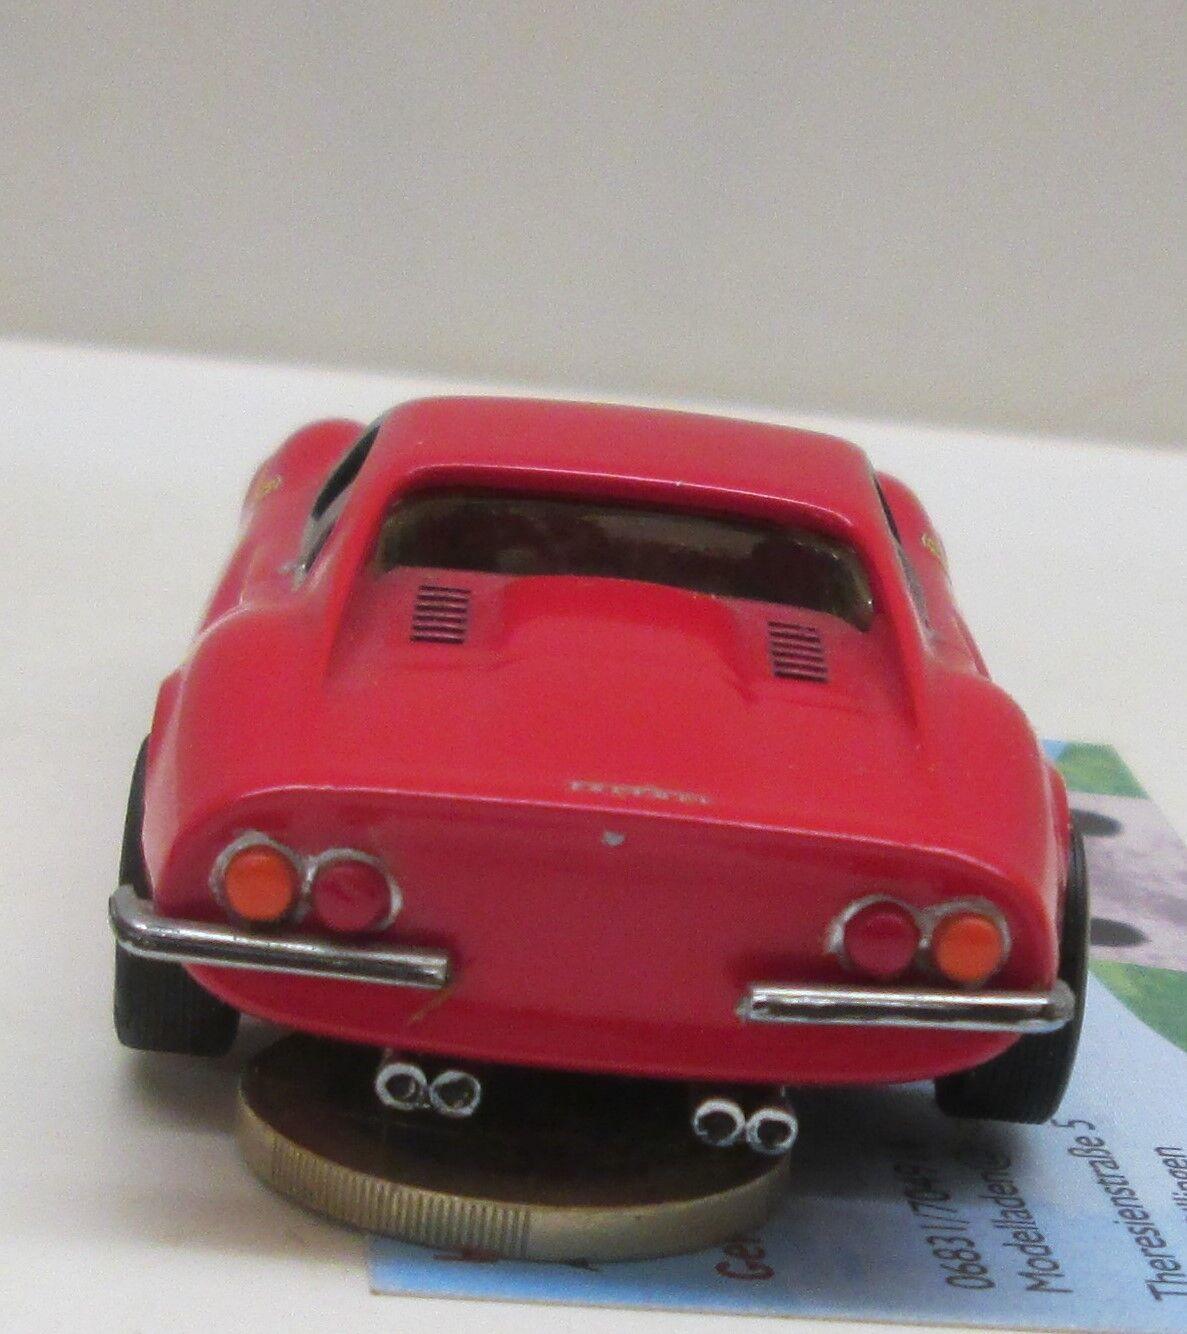 Kager Kager Kager Edition  ferrari 246 GT, rojo 5fa115